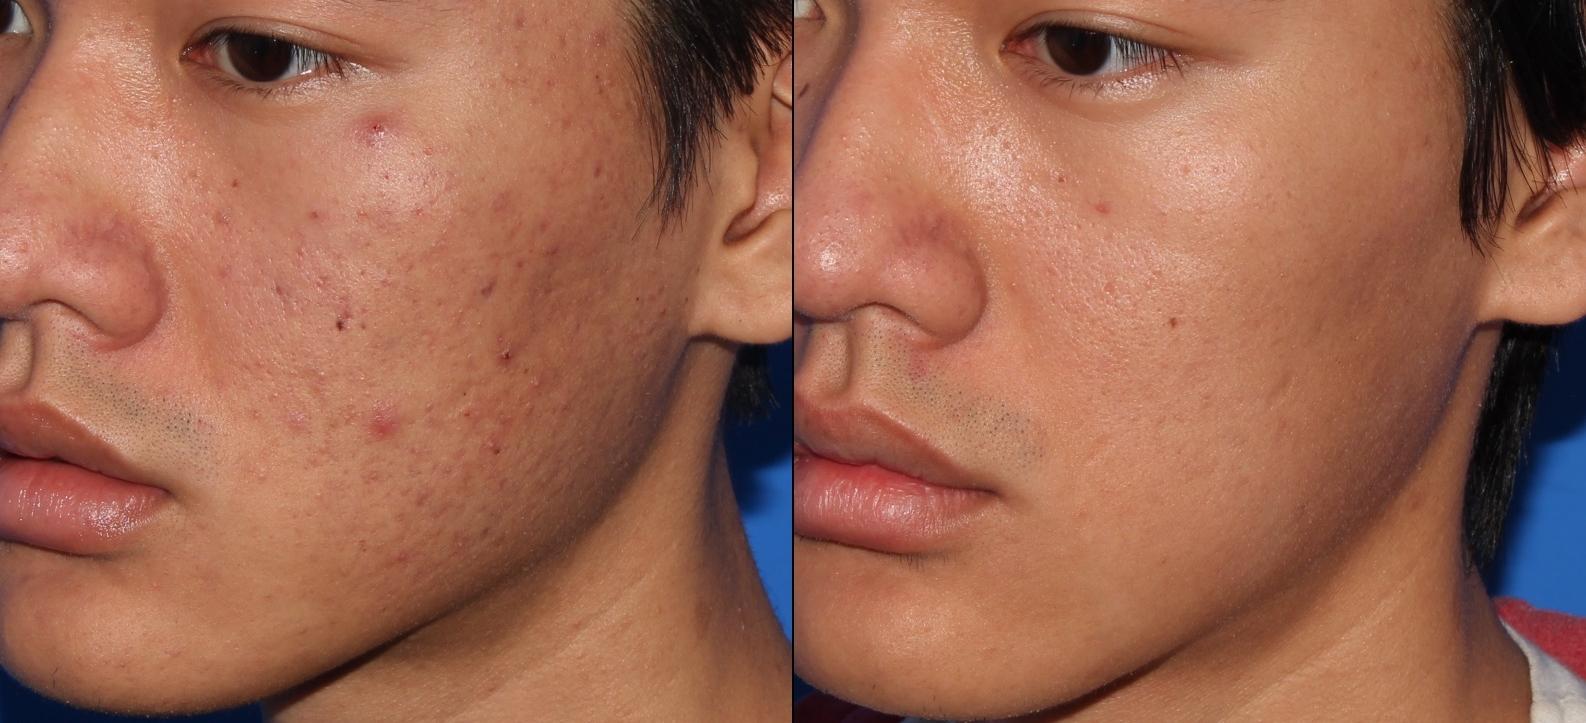 NailaMalikMD_Micropen-acne-scar-treatment-2.jpg